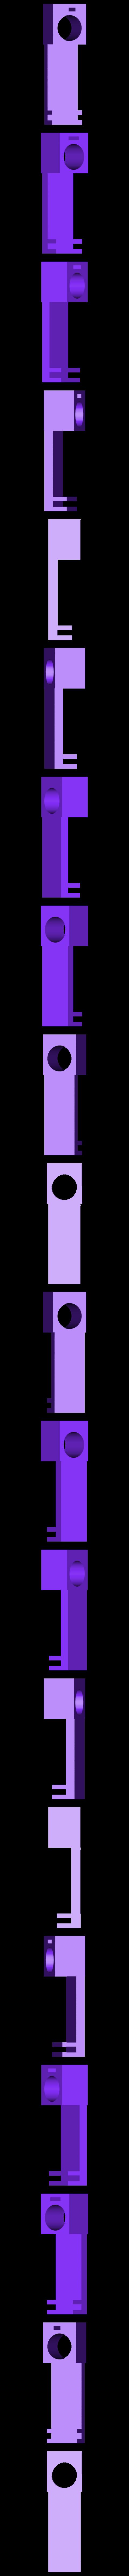 Pen/Pencil/Marker mount for Creality Ender 3 / CR-20